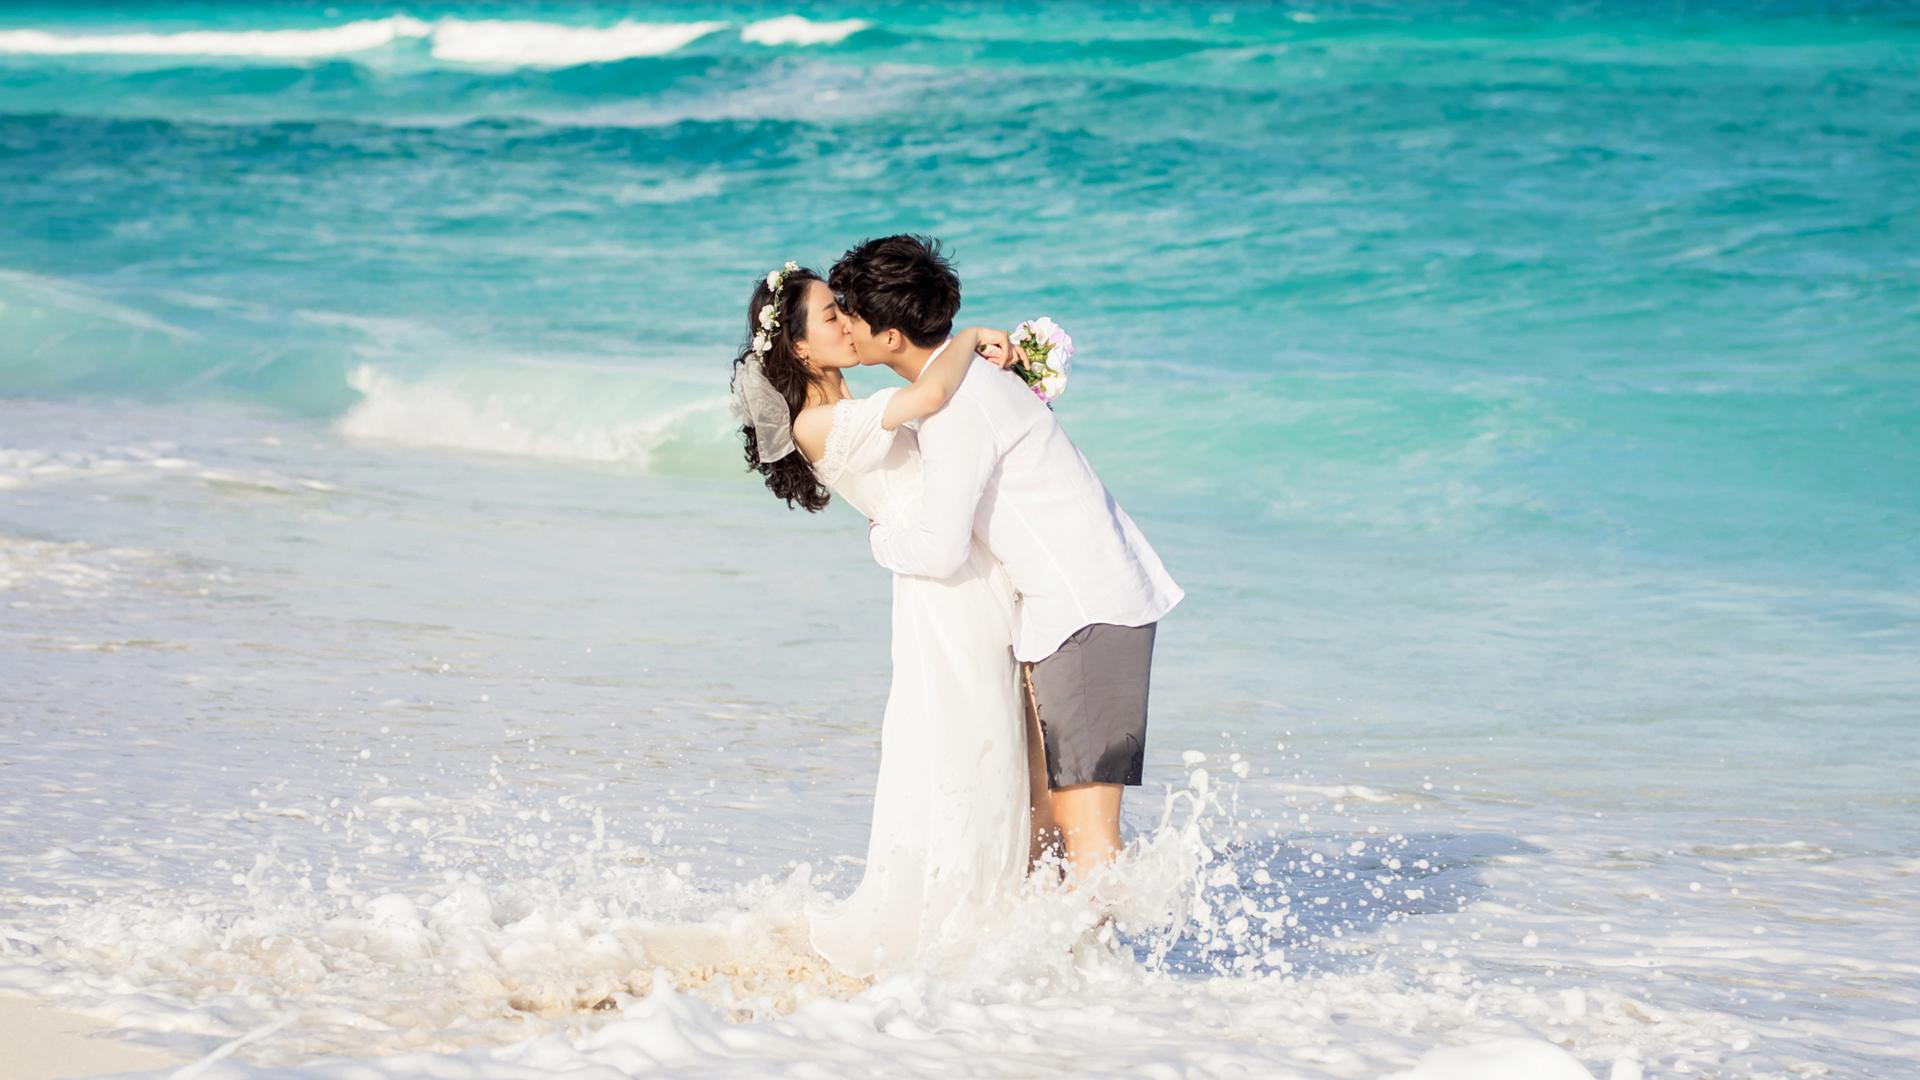 Sprazzi_Professional_Photography_Photographer_Cancun_Mexico_LewisTommy_Original_21.jpg